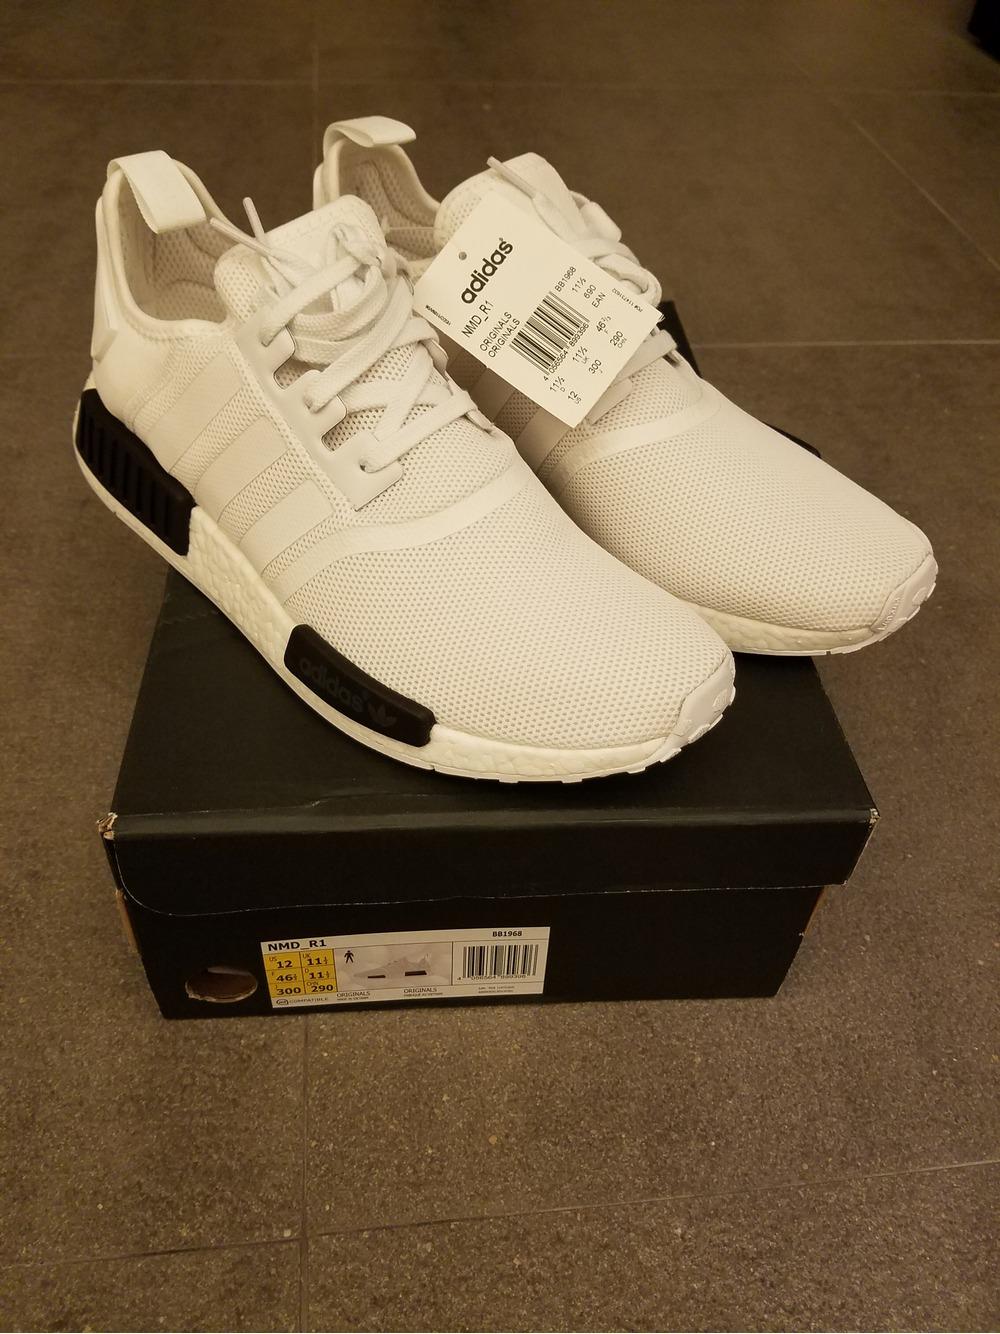 Adidas NMD_XR1 Primeknit Homme Sneakers Blanc/Blanc BB1967